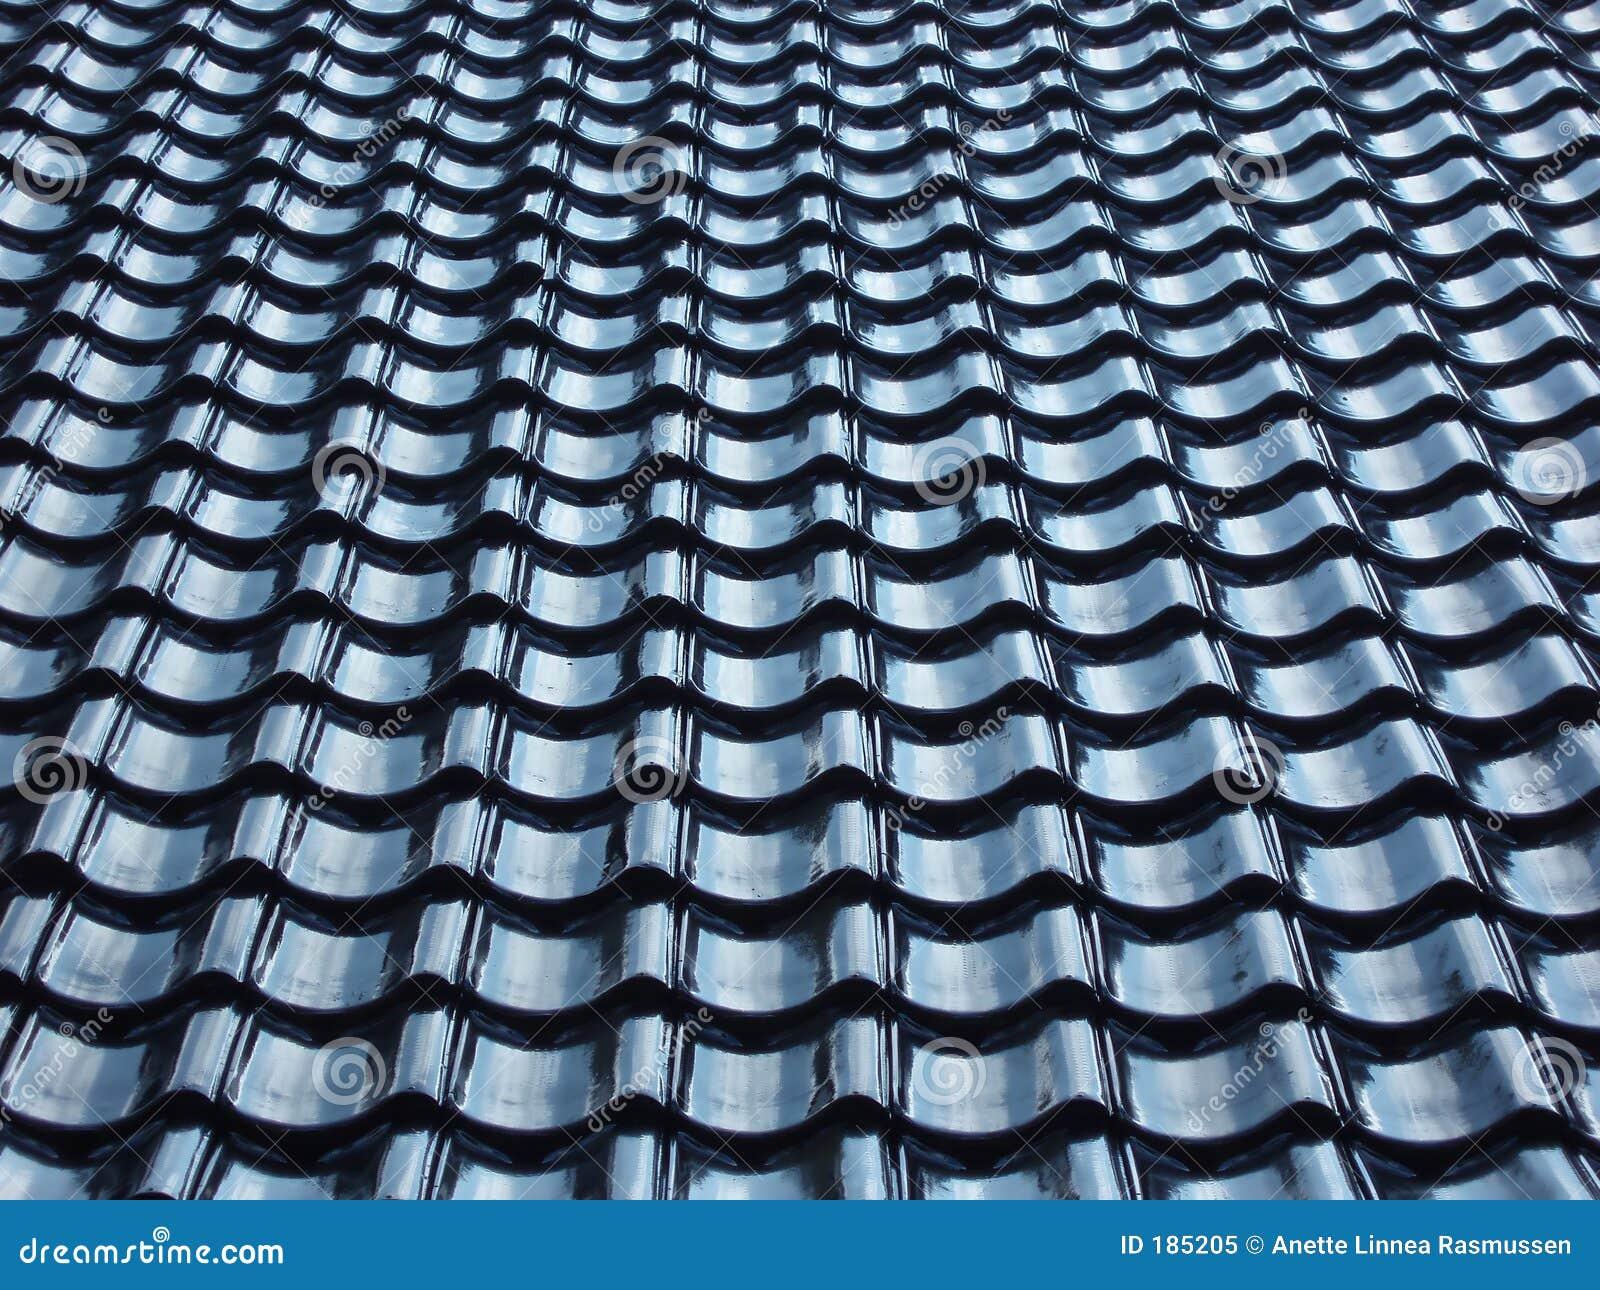 Pattern of black tiled roof